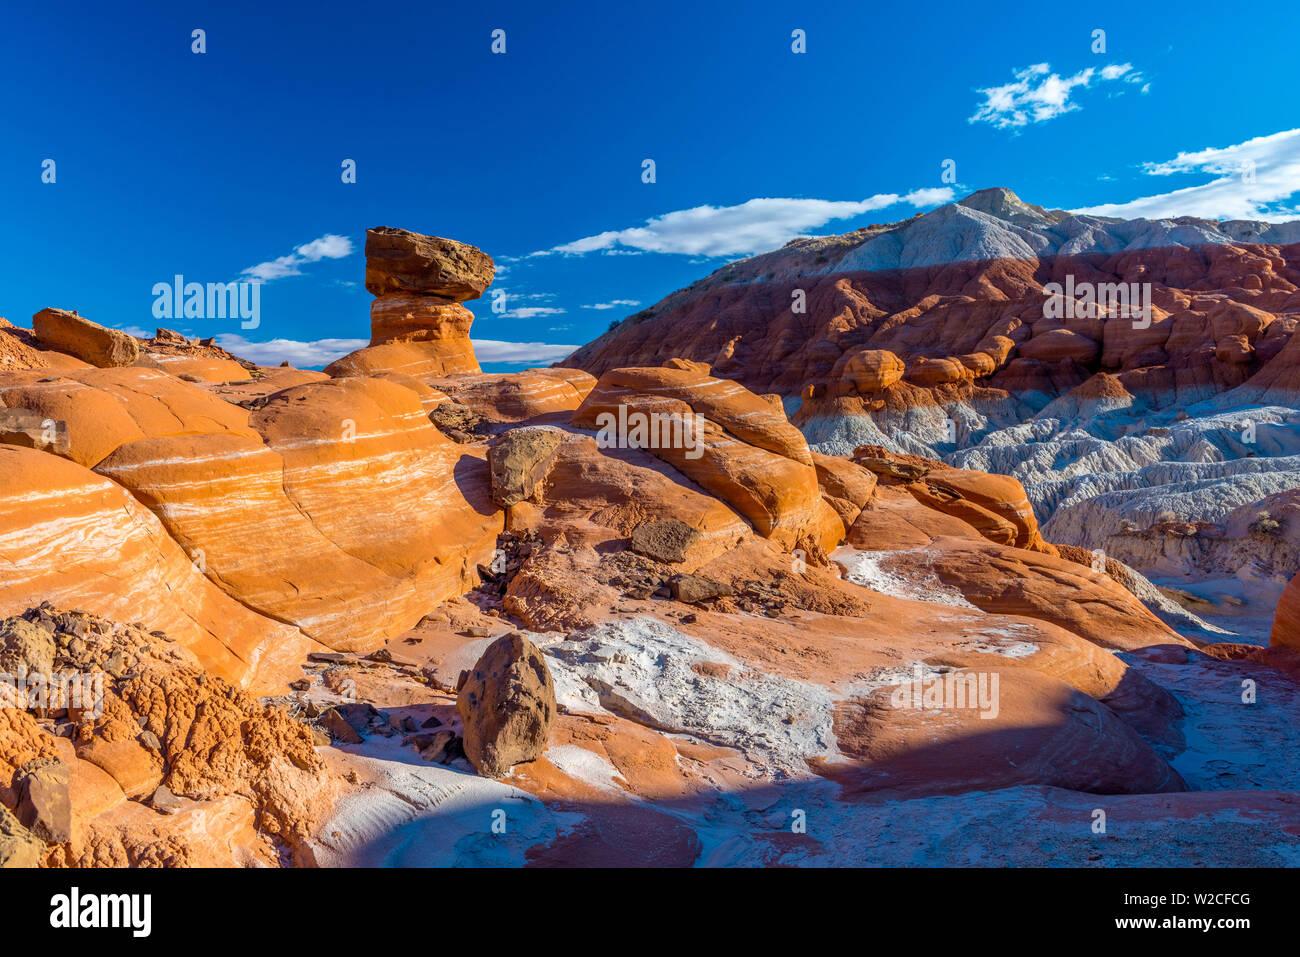 USA, Utah, Grand Staircase Escalante National Monument, The Toadstools Stock Photo